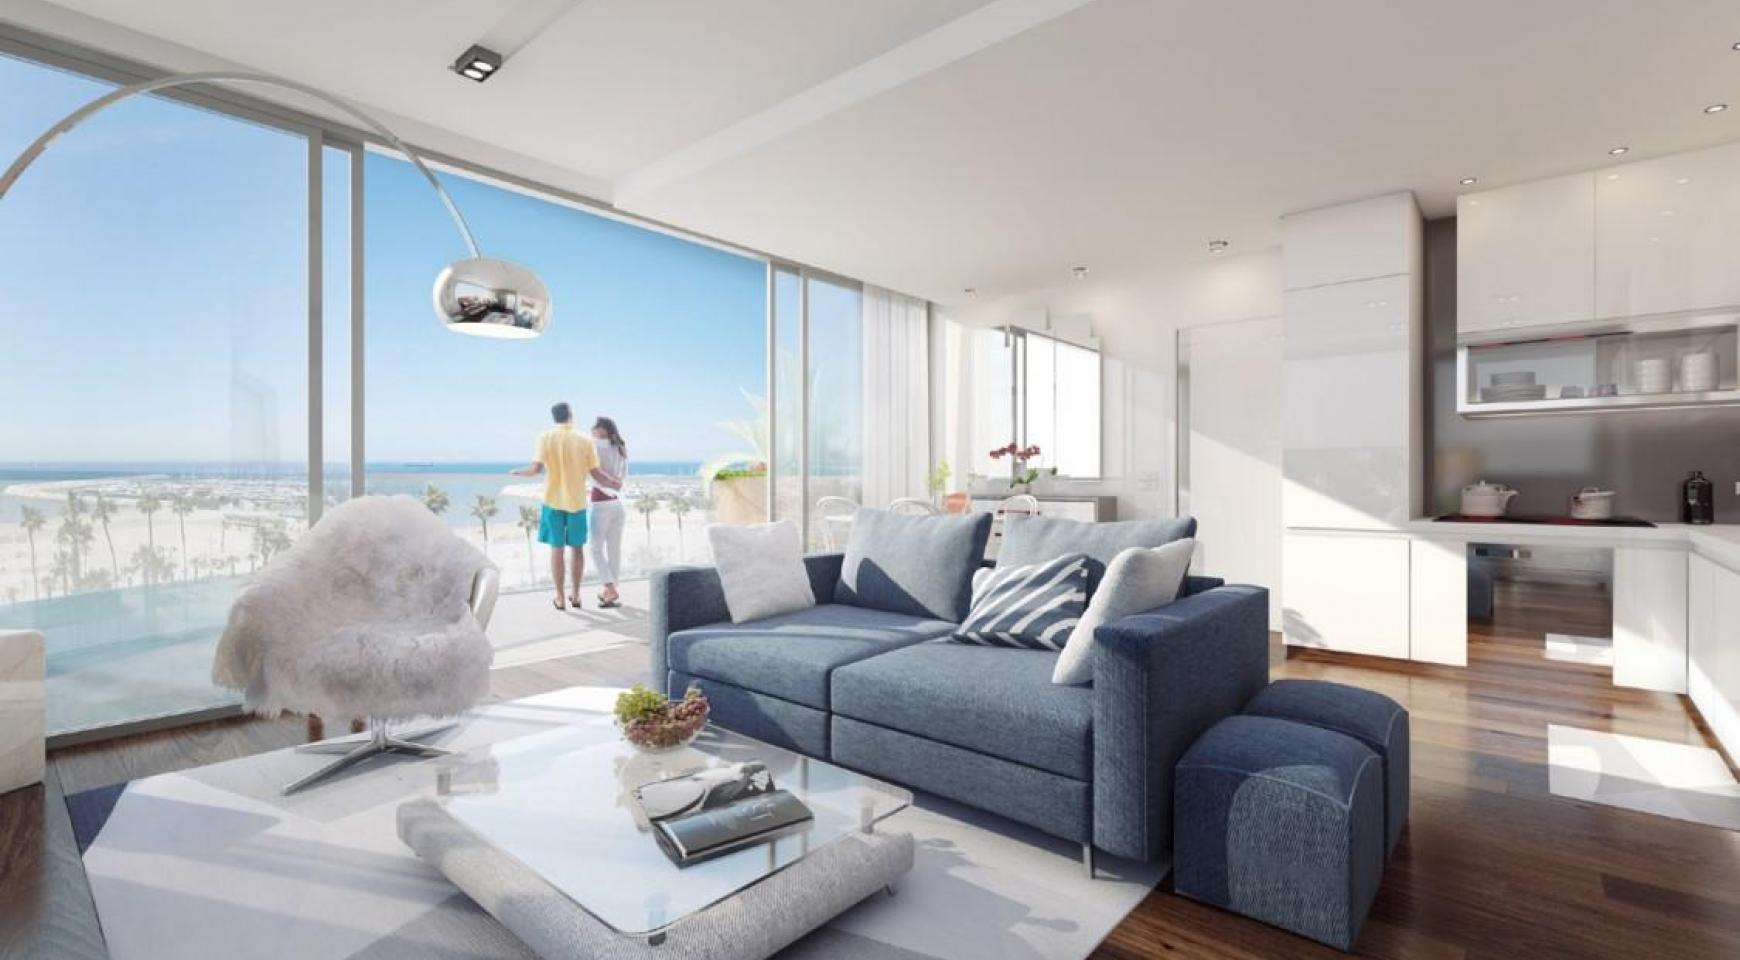 New 2 Bedroom Apartment near the Sea - 6